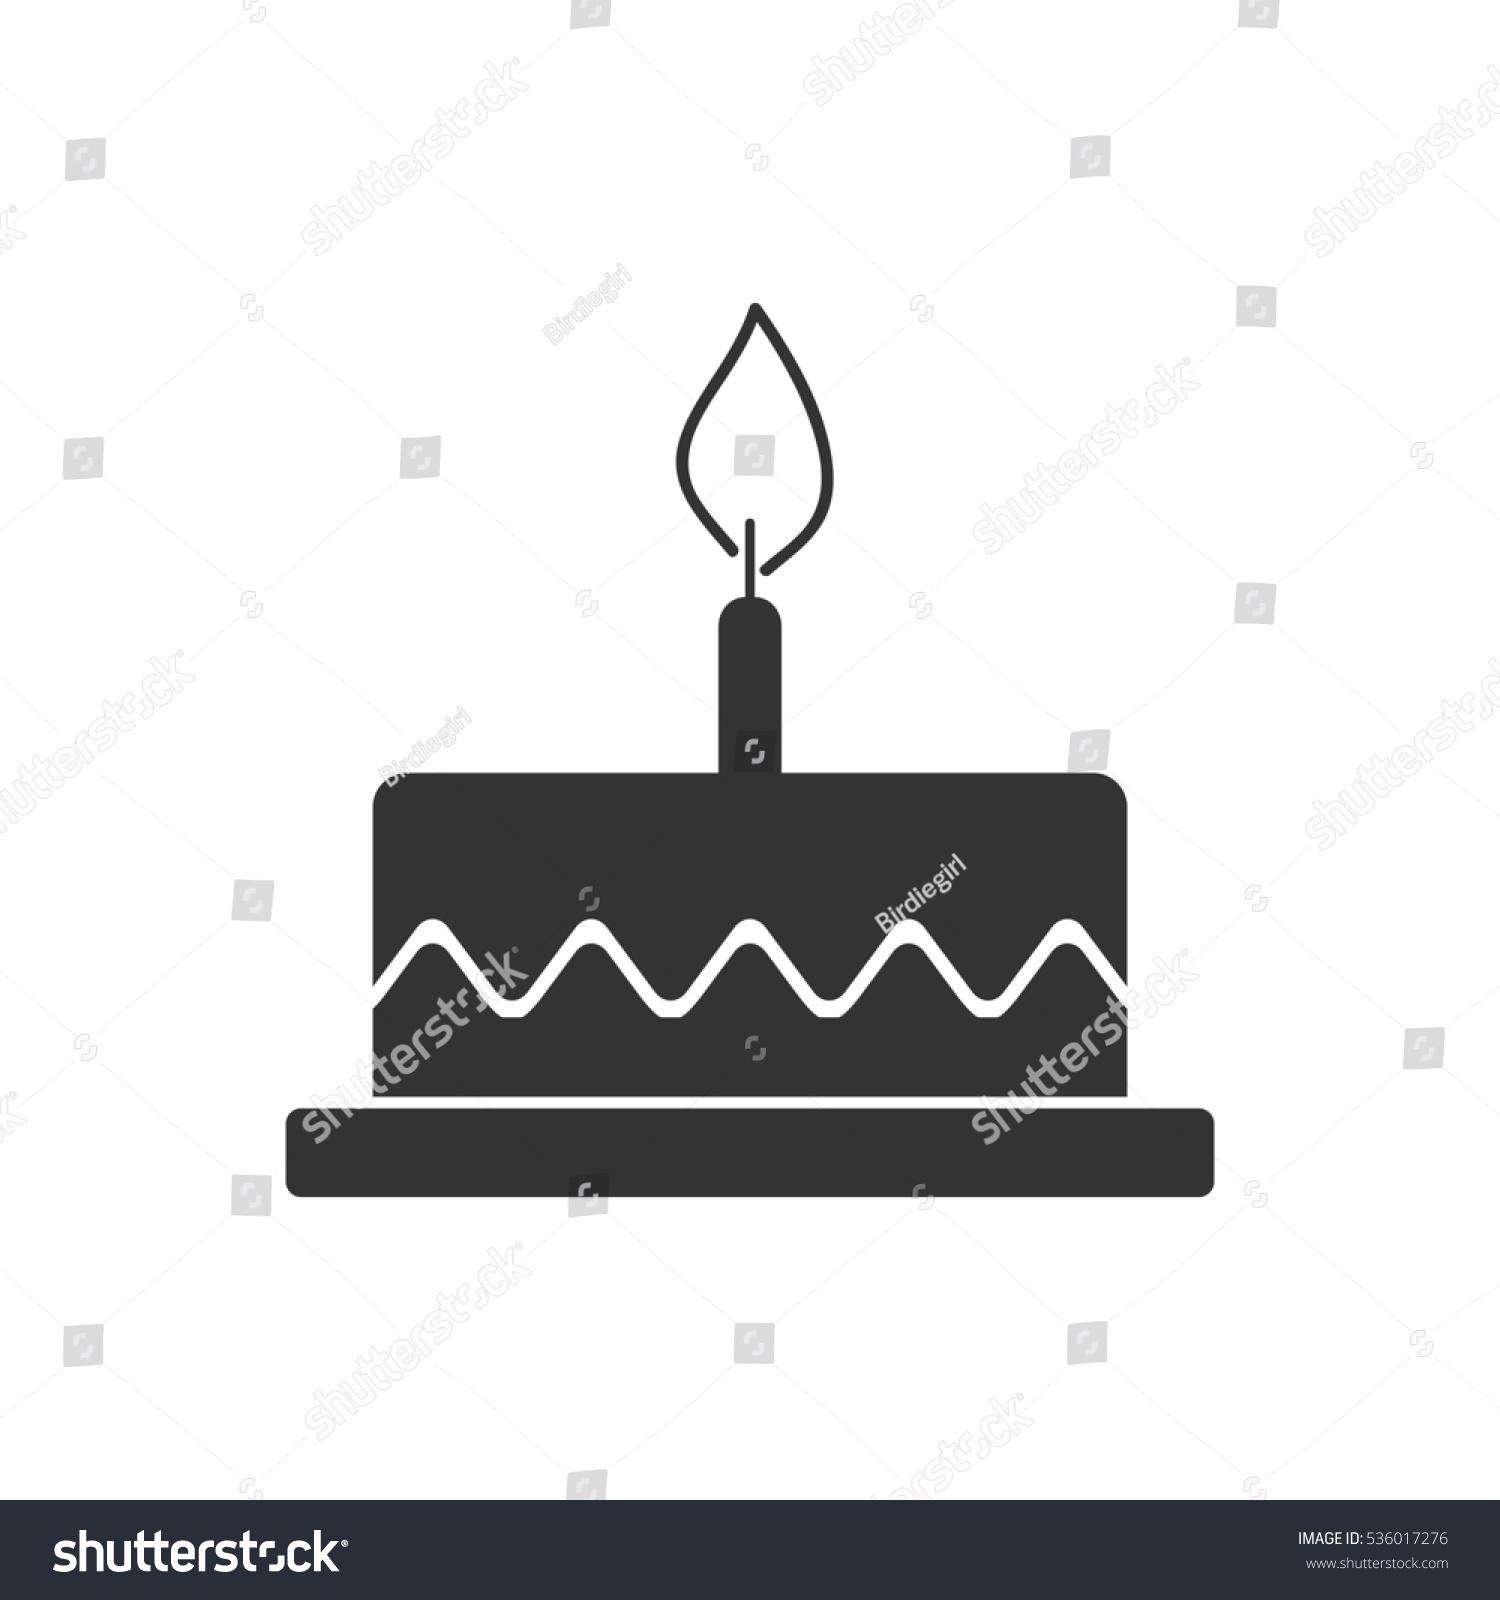 Birthday cake icon flat grey symbol stock illustration 536017276 birthday cake icon flat grey symbol illustration isolated on white background biocorpaavc